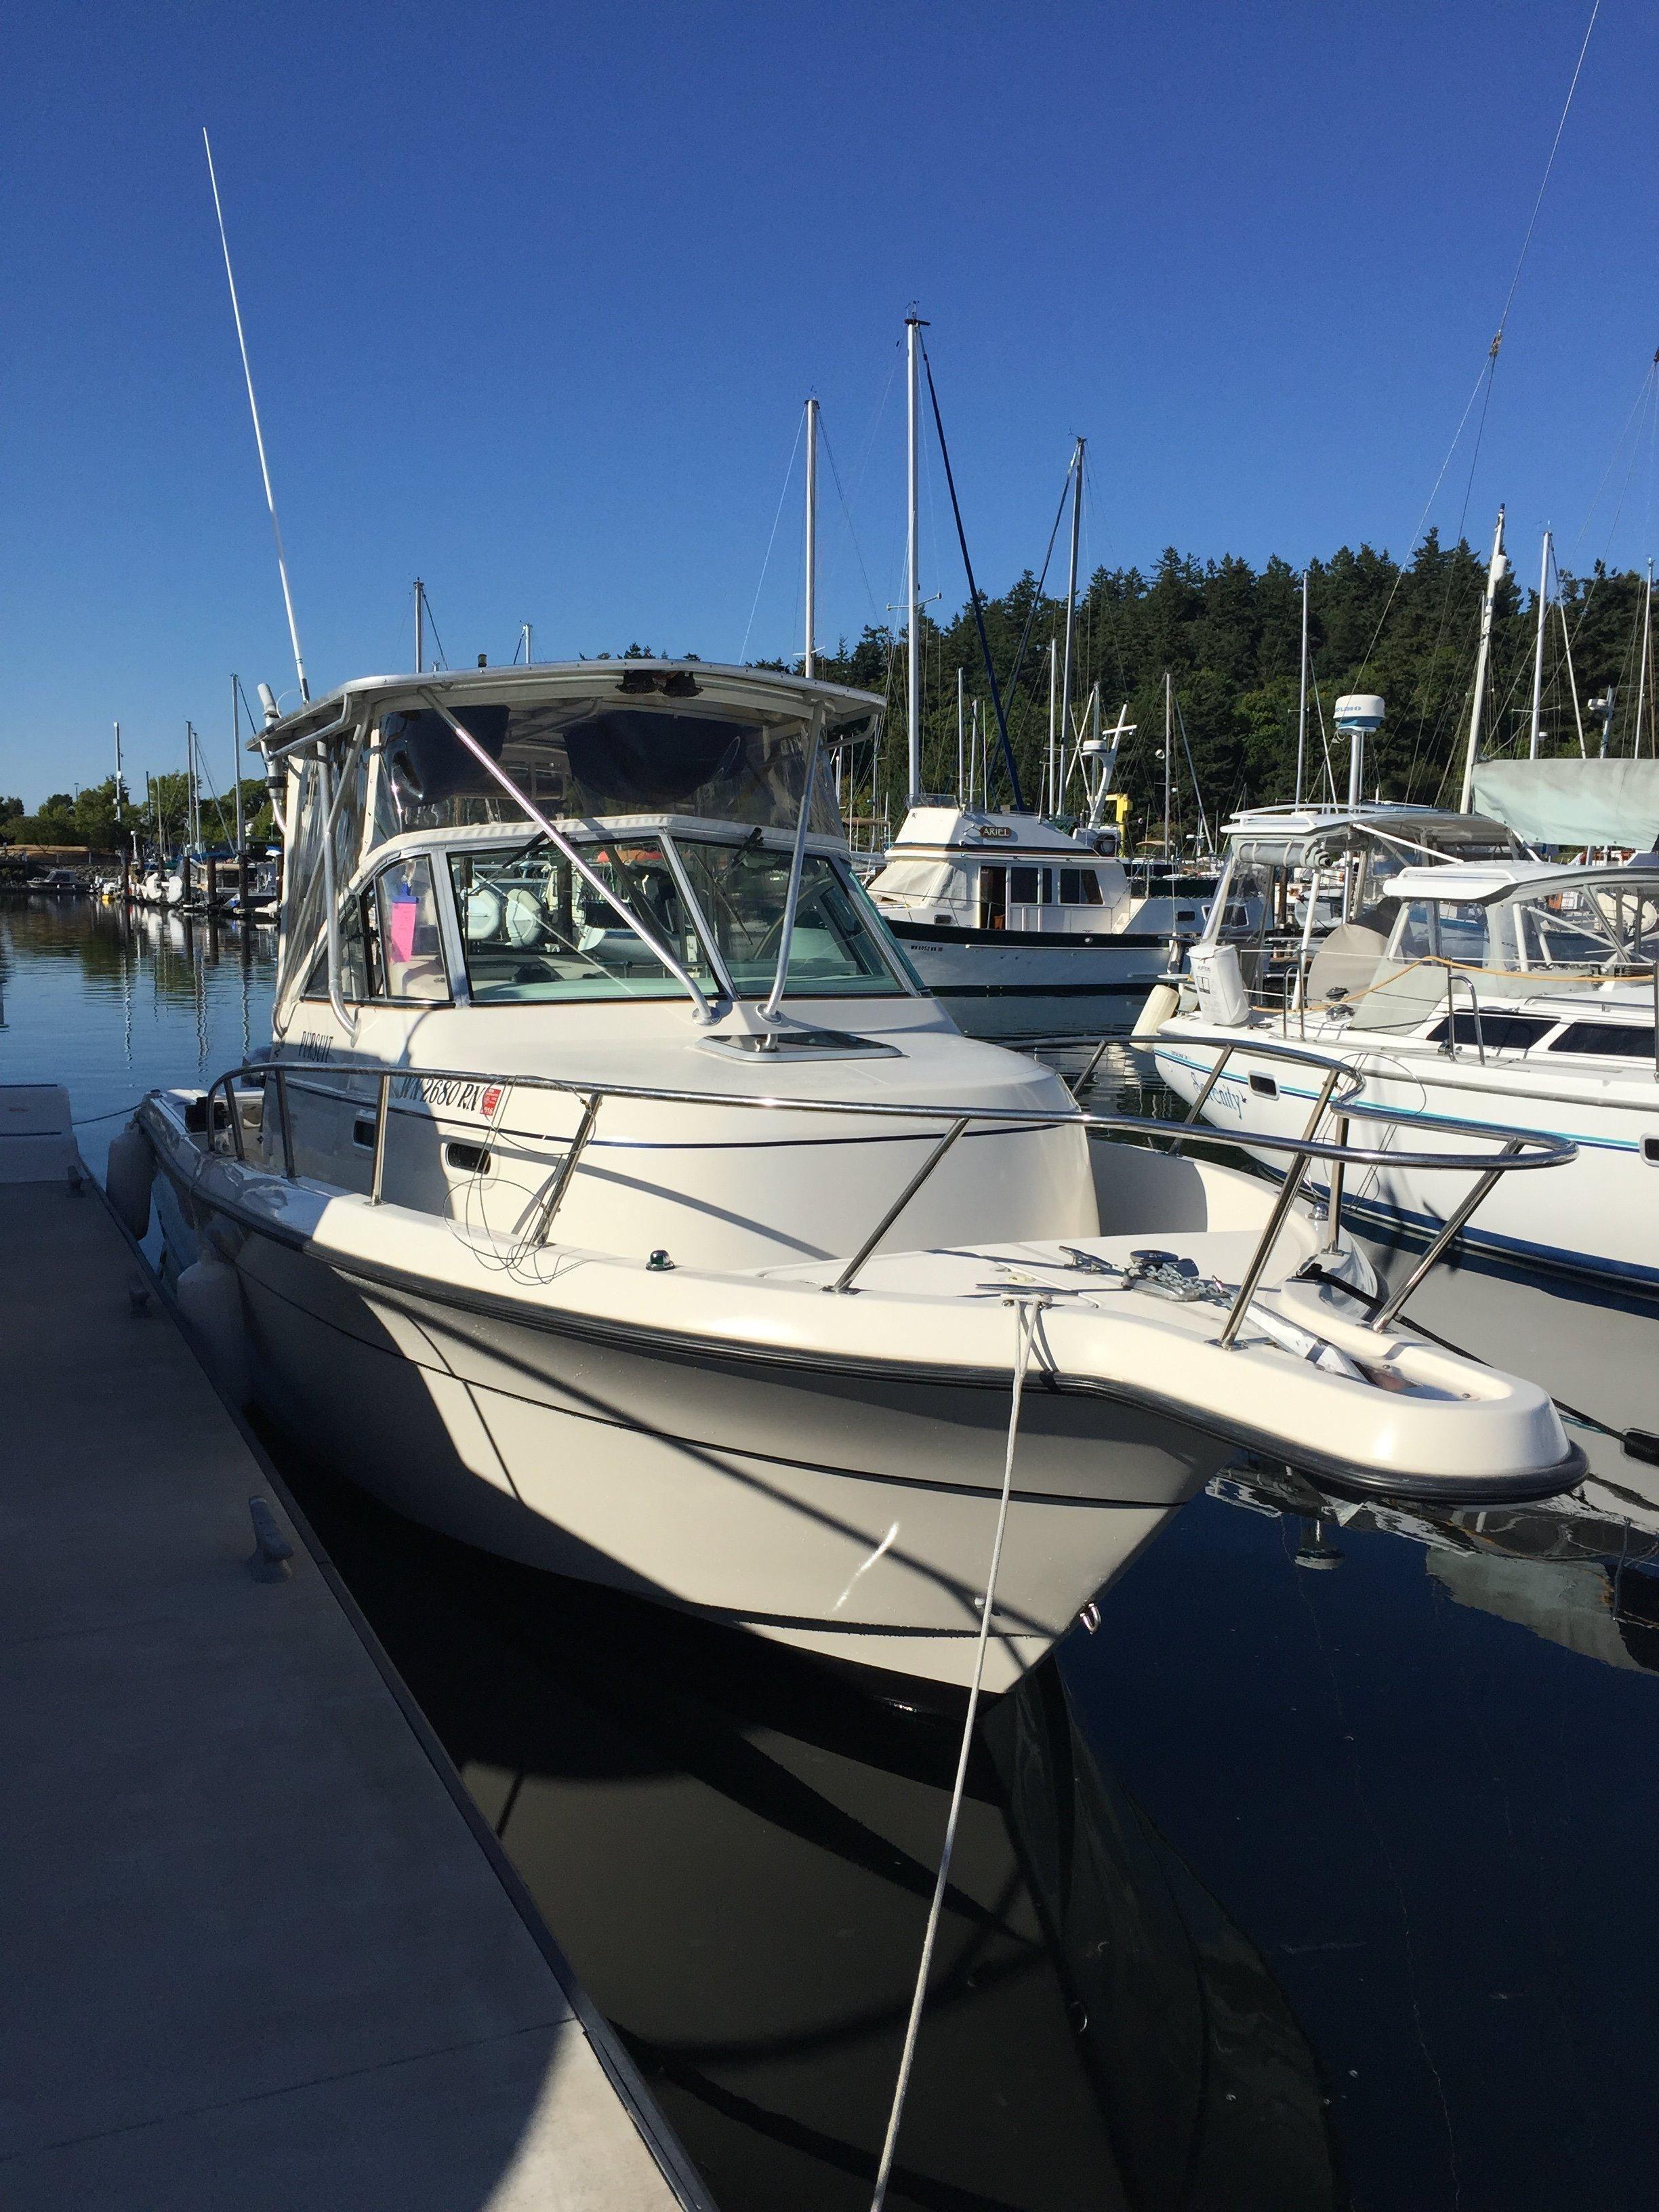 2000 Pursuit 2870 Walkaround Power Boat For Sale Www